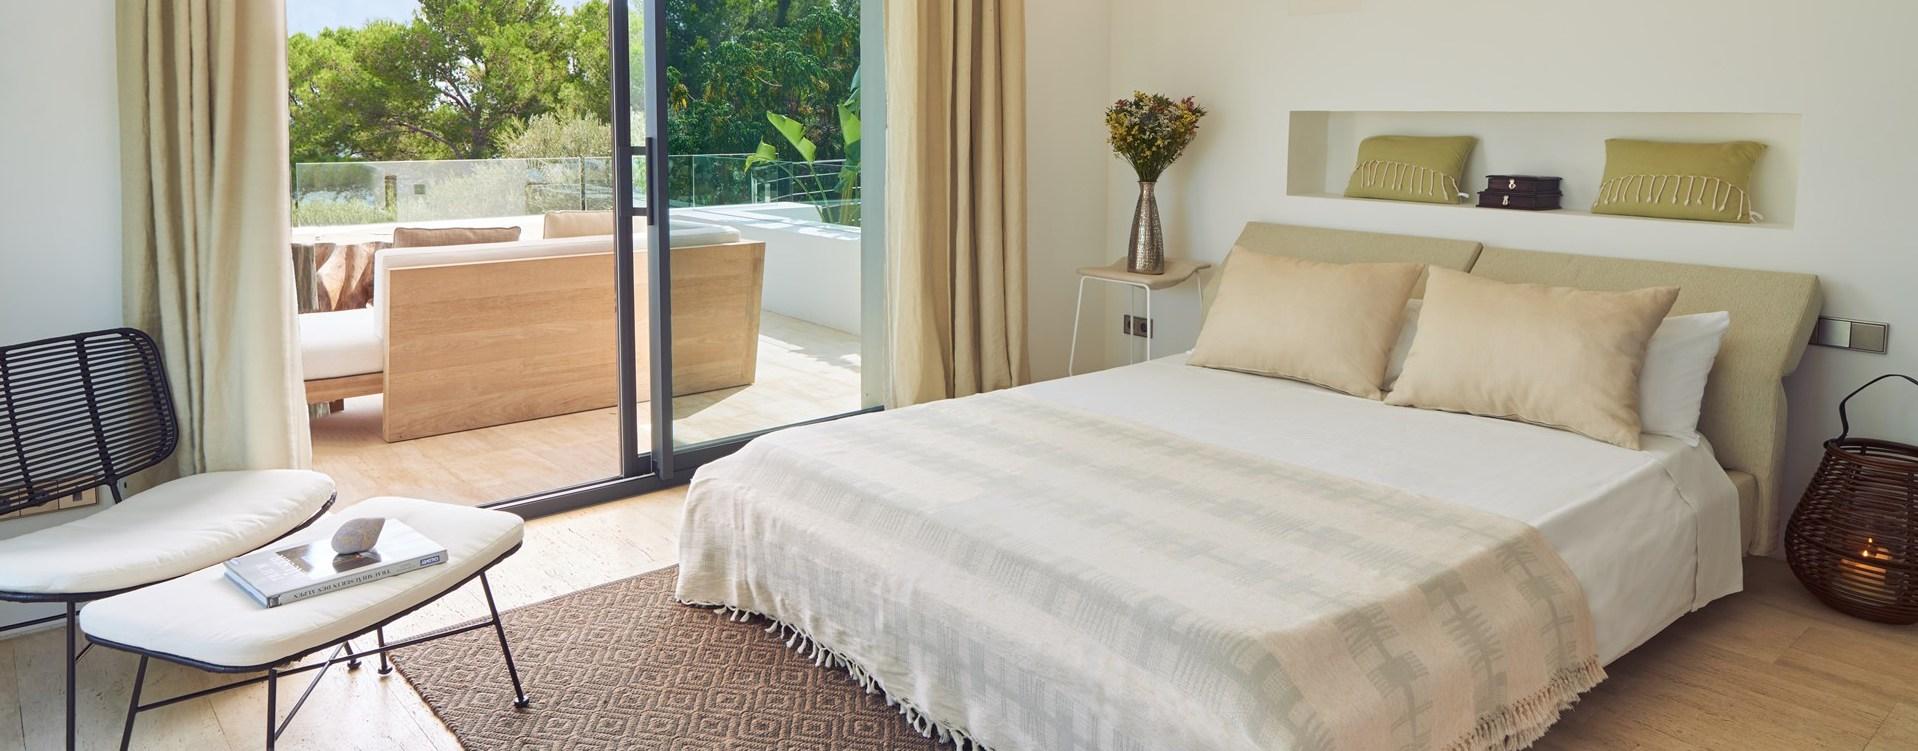 villa-can-castello-double-bedroom5